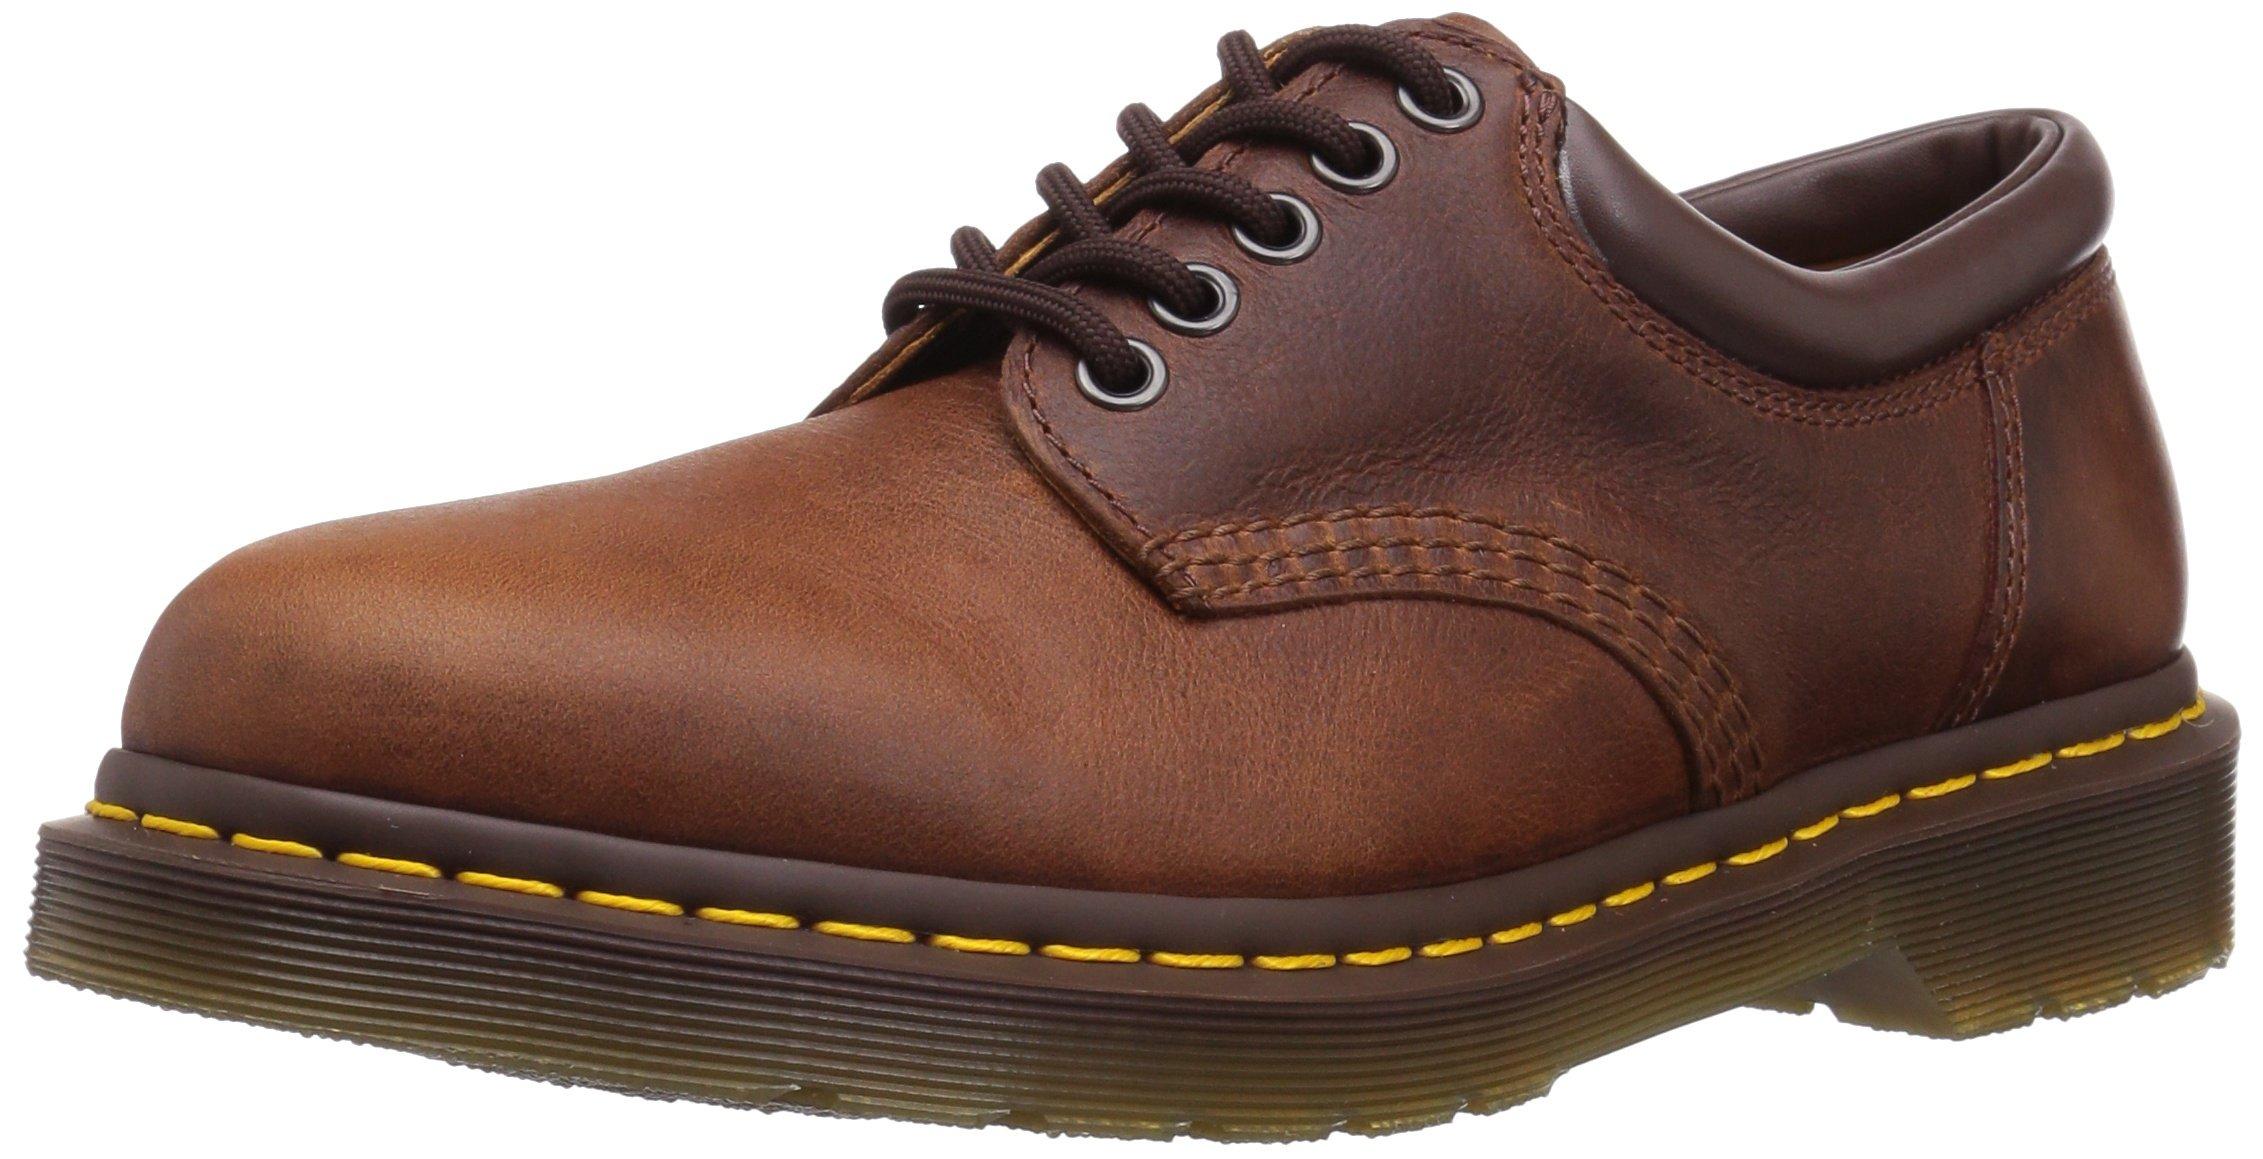 Dr. Martens 8053 5 Eye Padded Collar Shoe, Tan Harvest, 11 UK/12 US Men